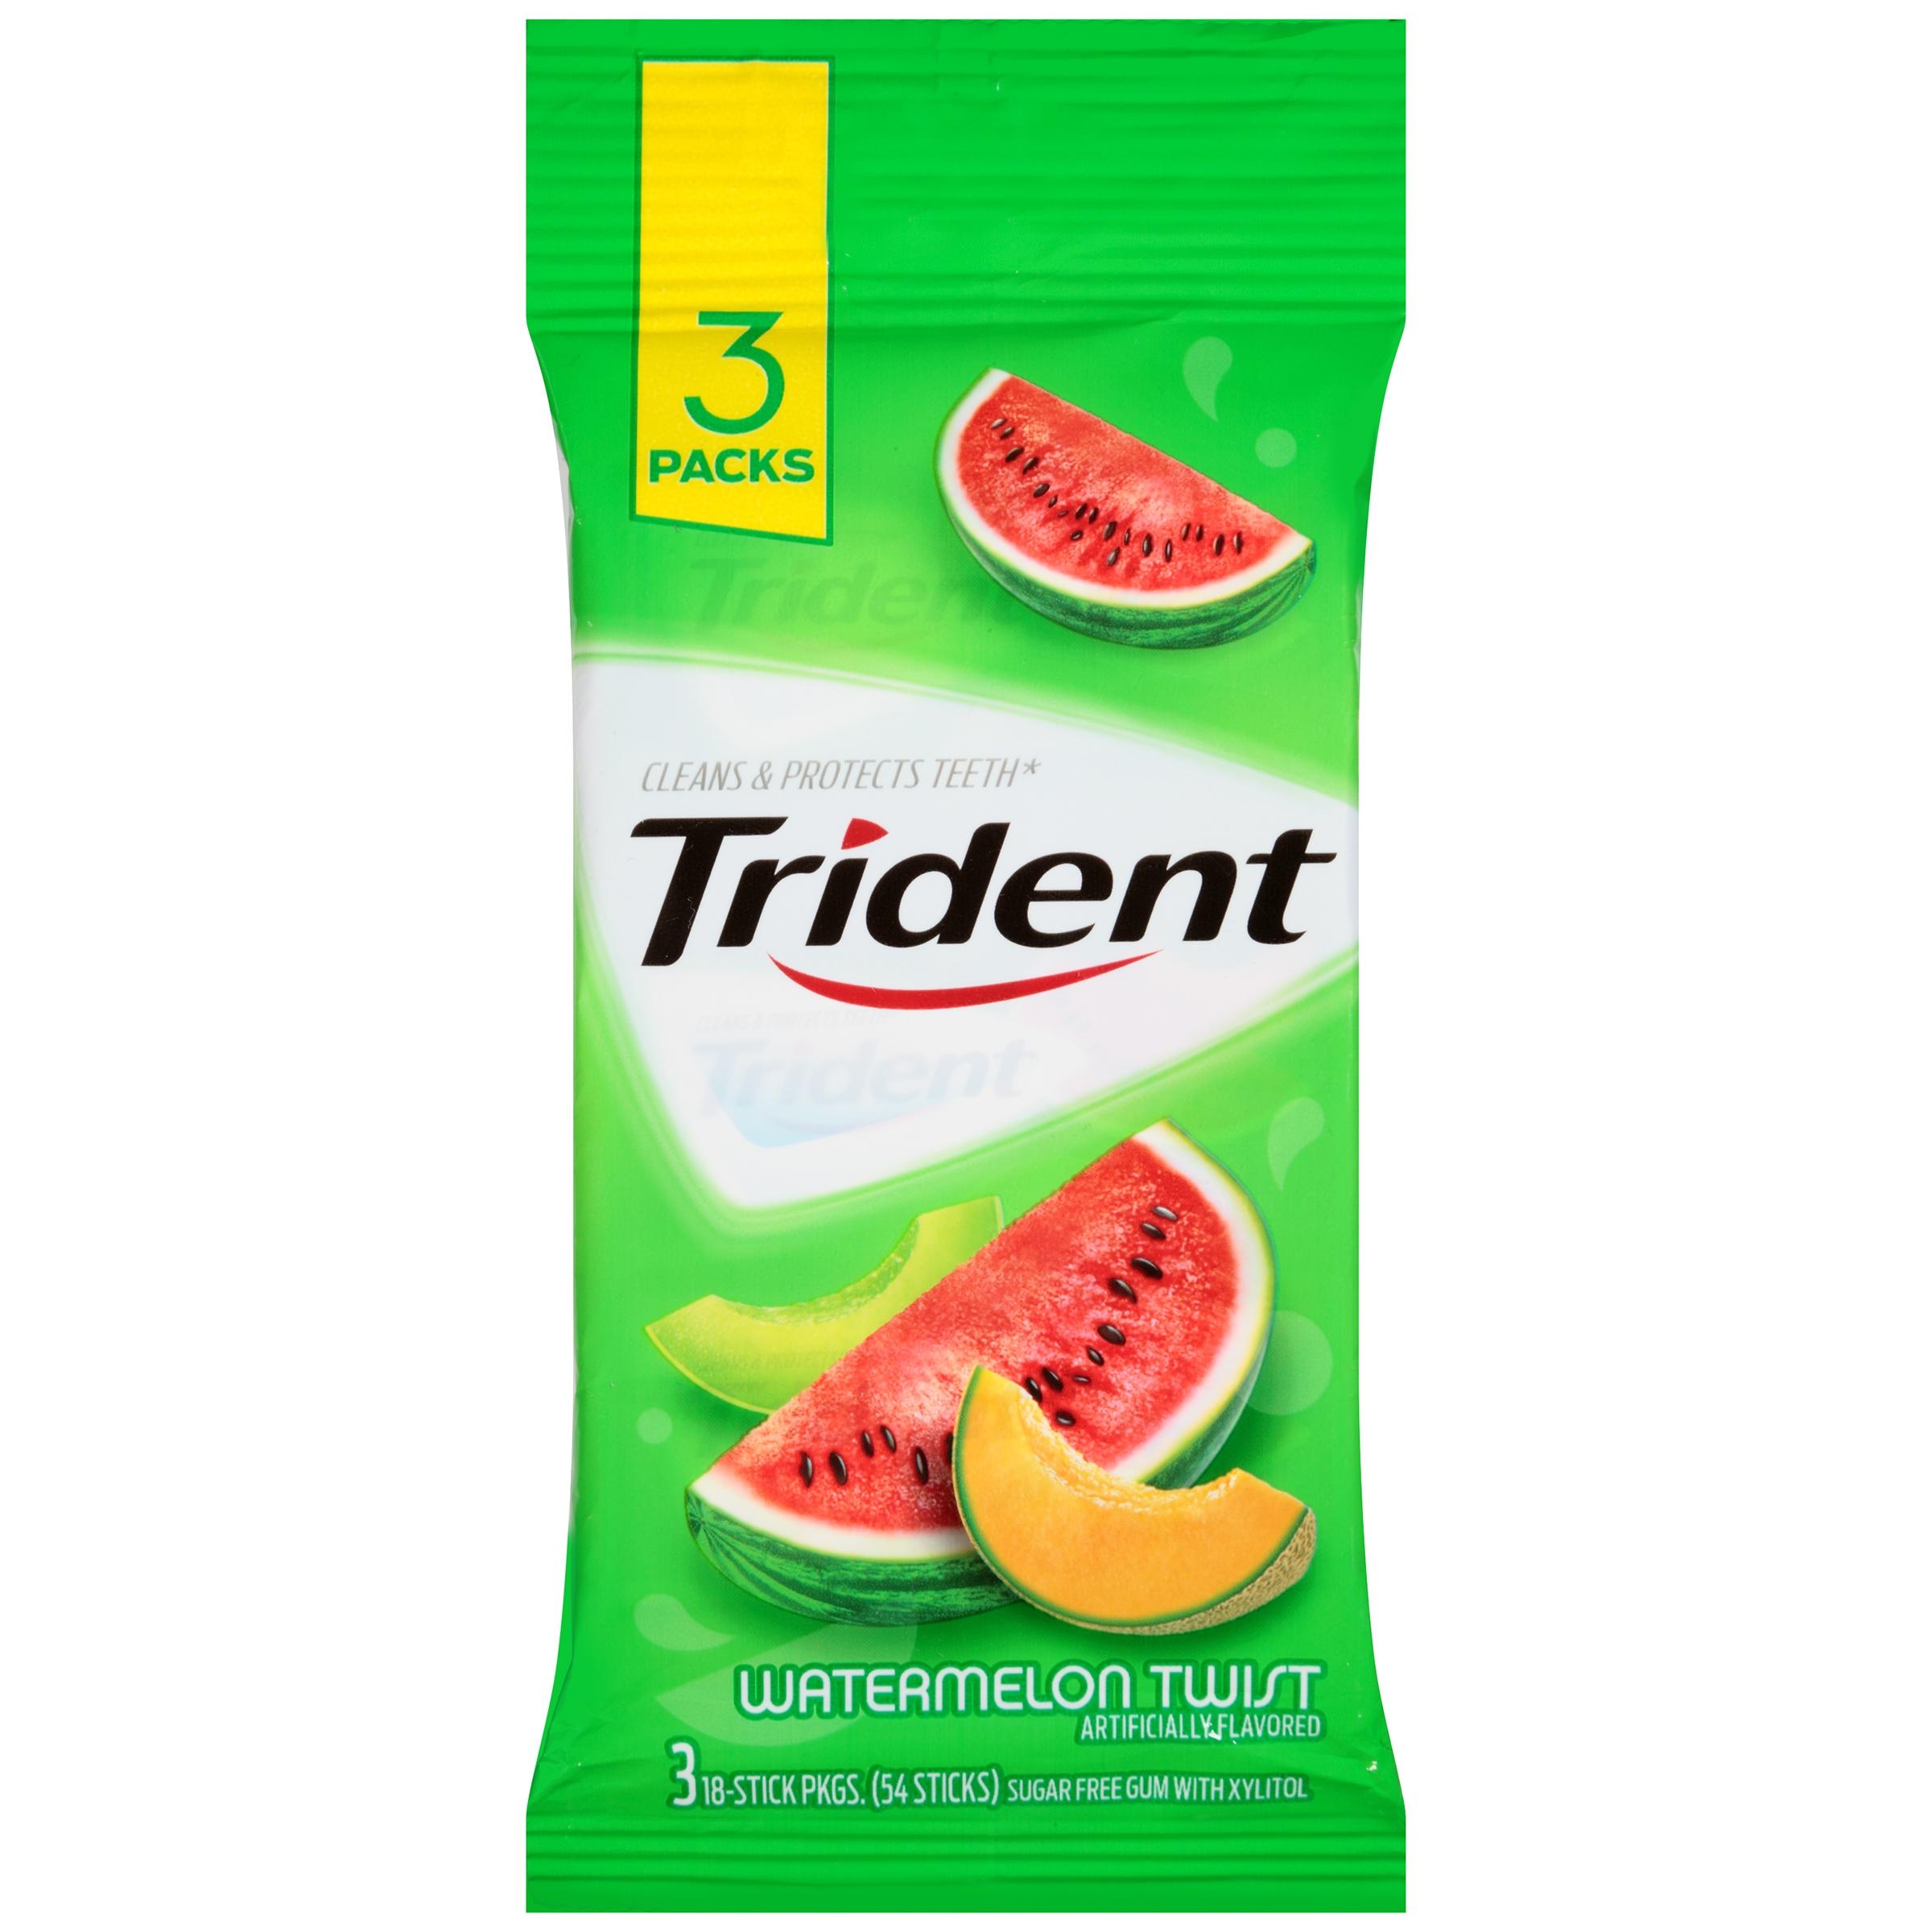 Mondelez Global LLC Cadbury Adams Usa Llc Trident Watermelon Twist Sugar Free Gum With Xylitol 3 - 18 Stick Packs